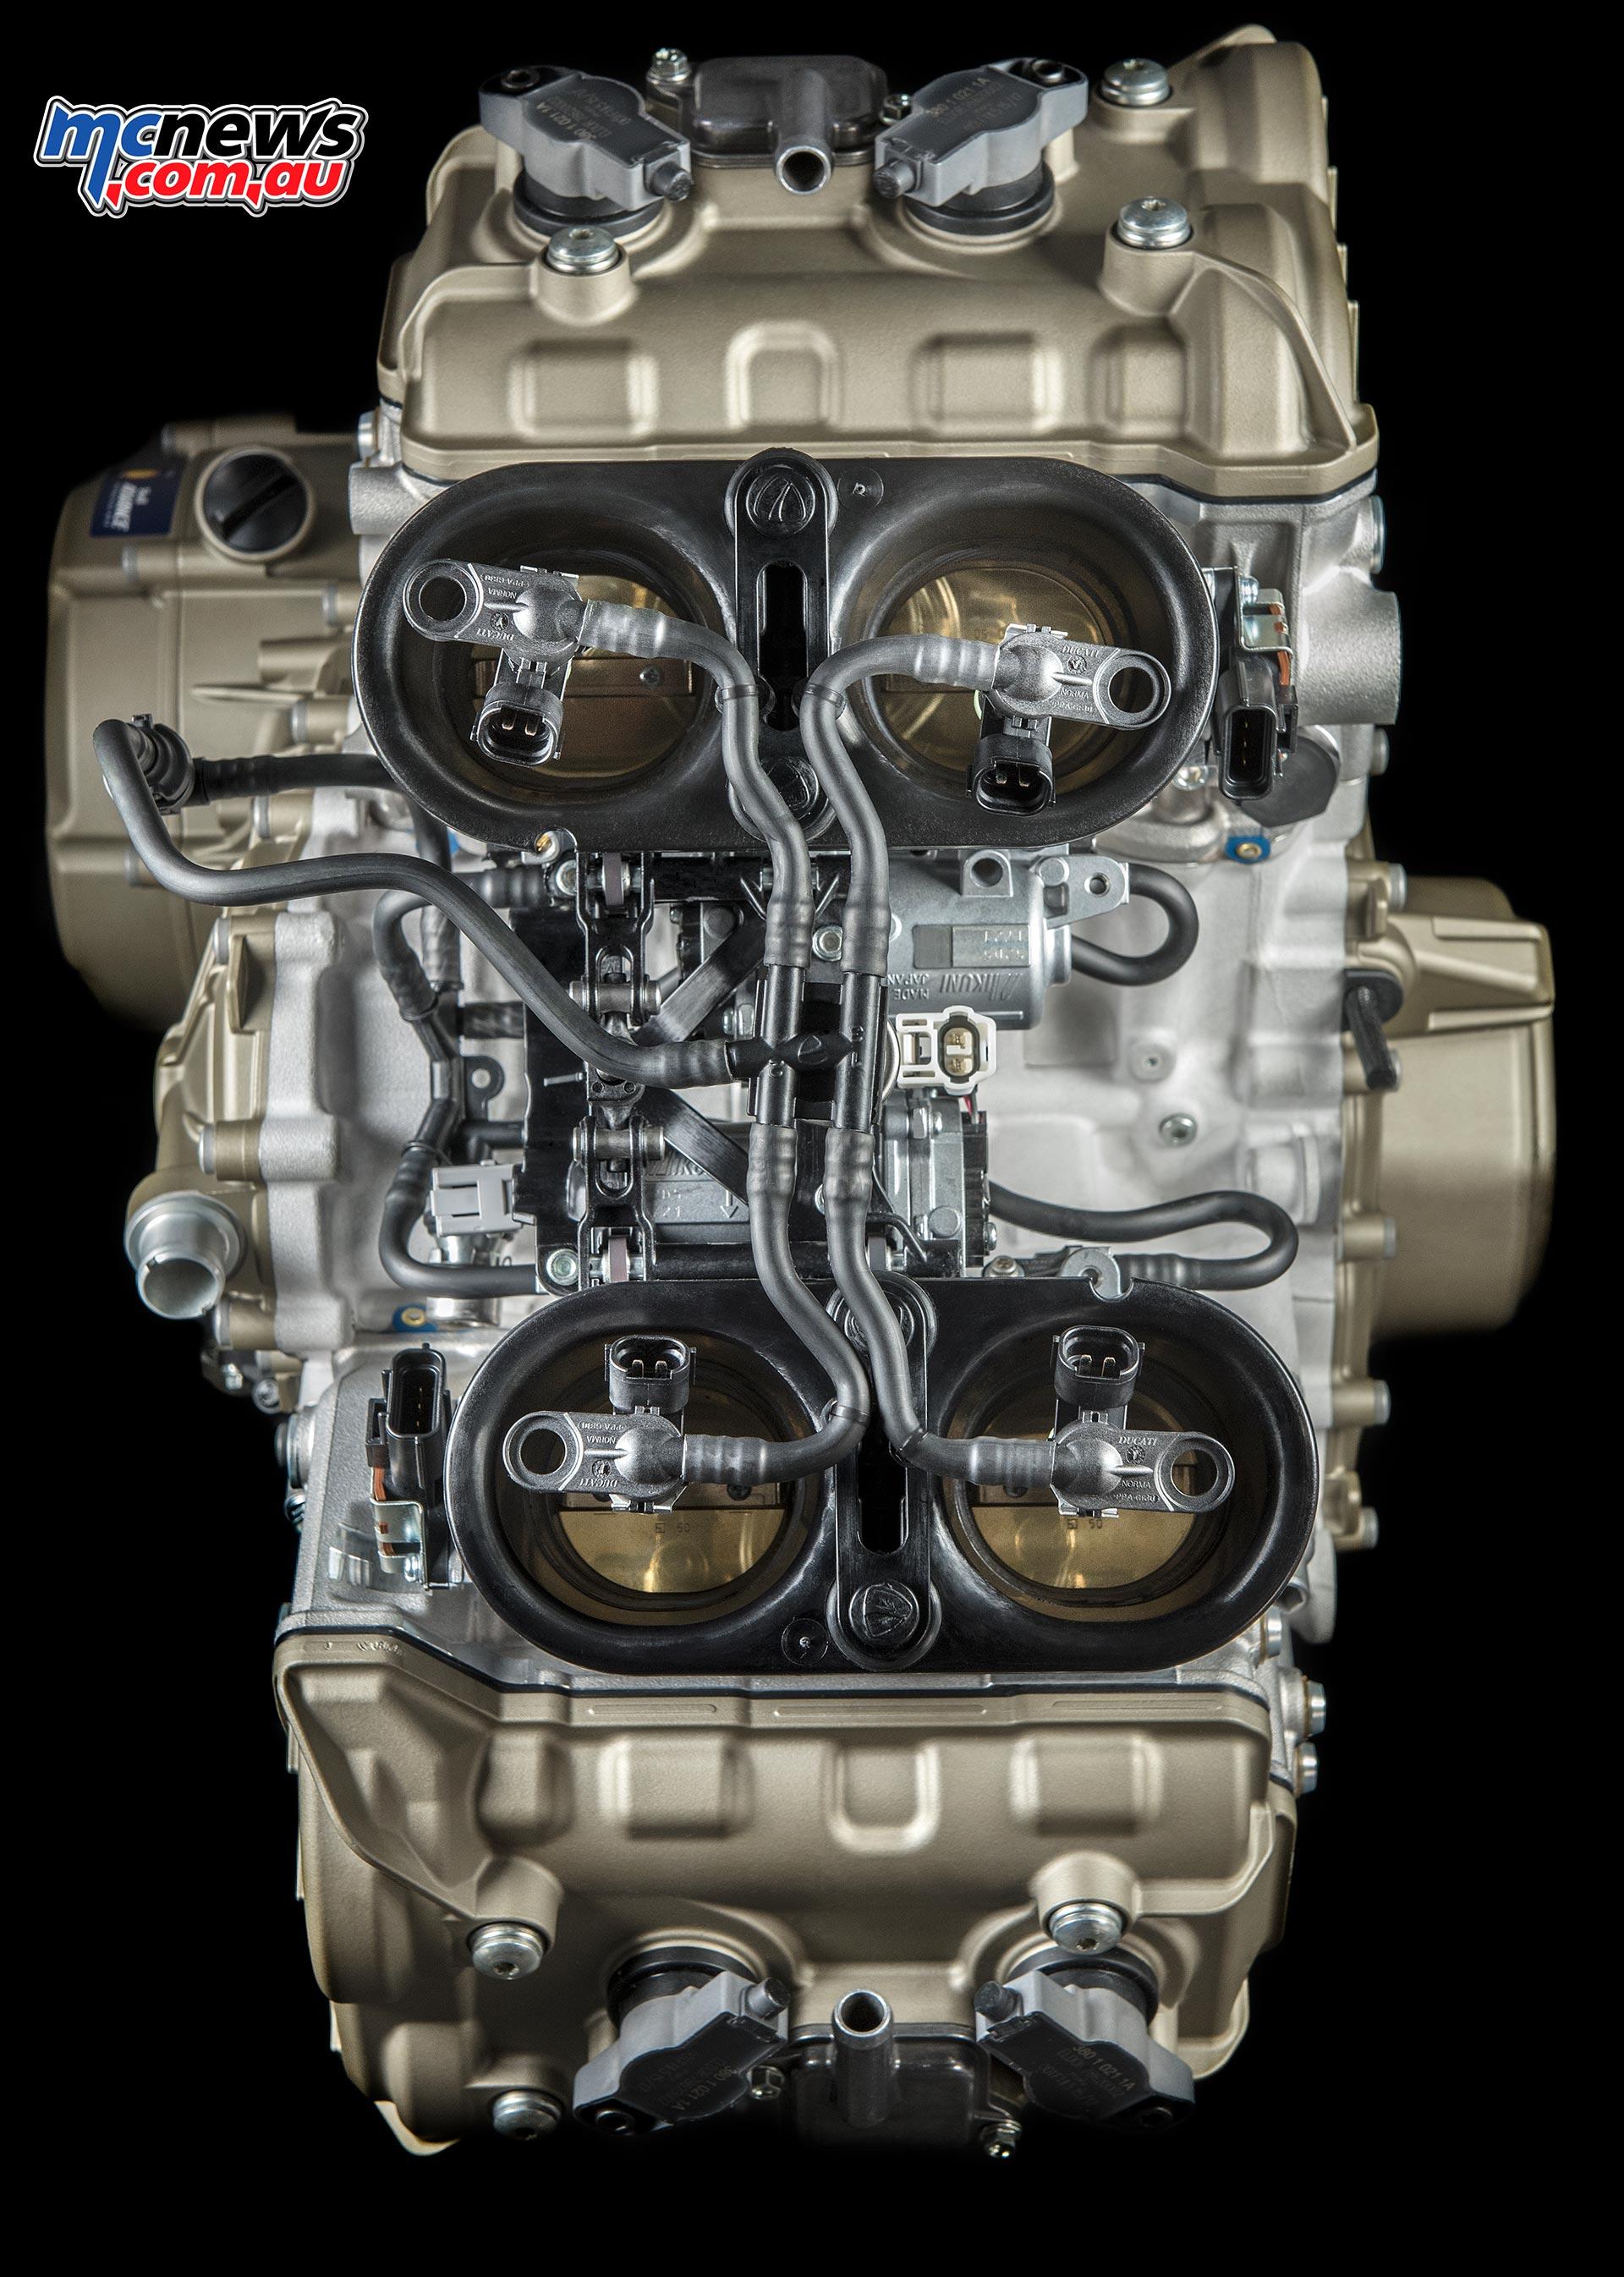 Ducati Desmosedici Stradale Engine | 1103cc V-4 | MCNews.com.au